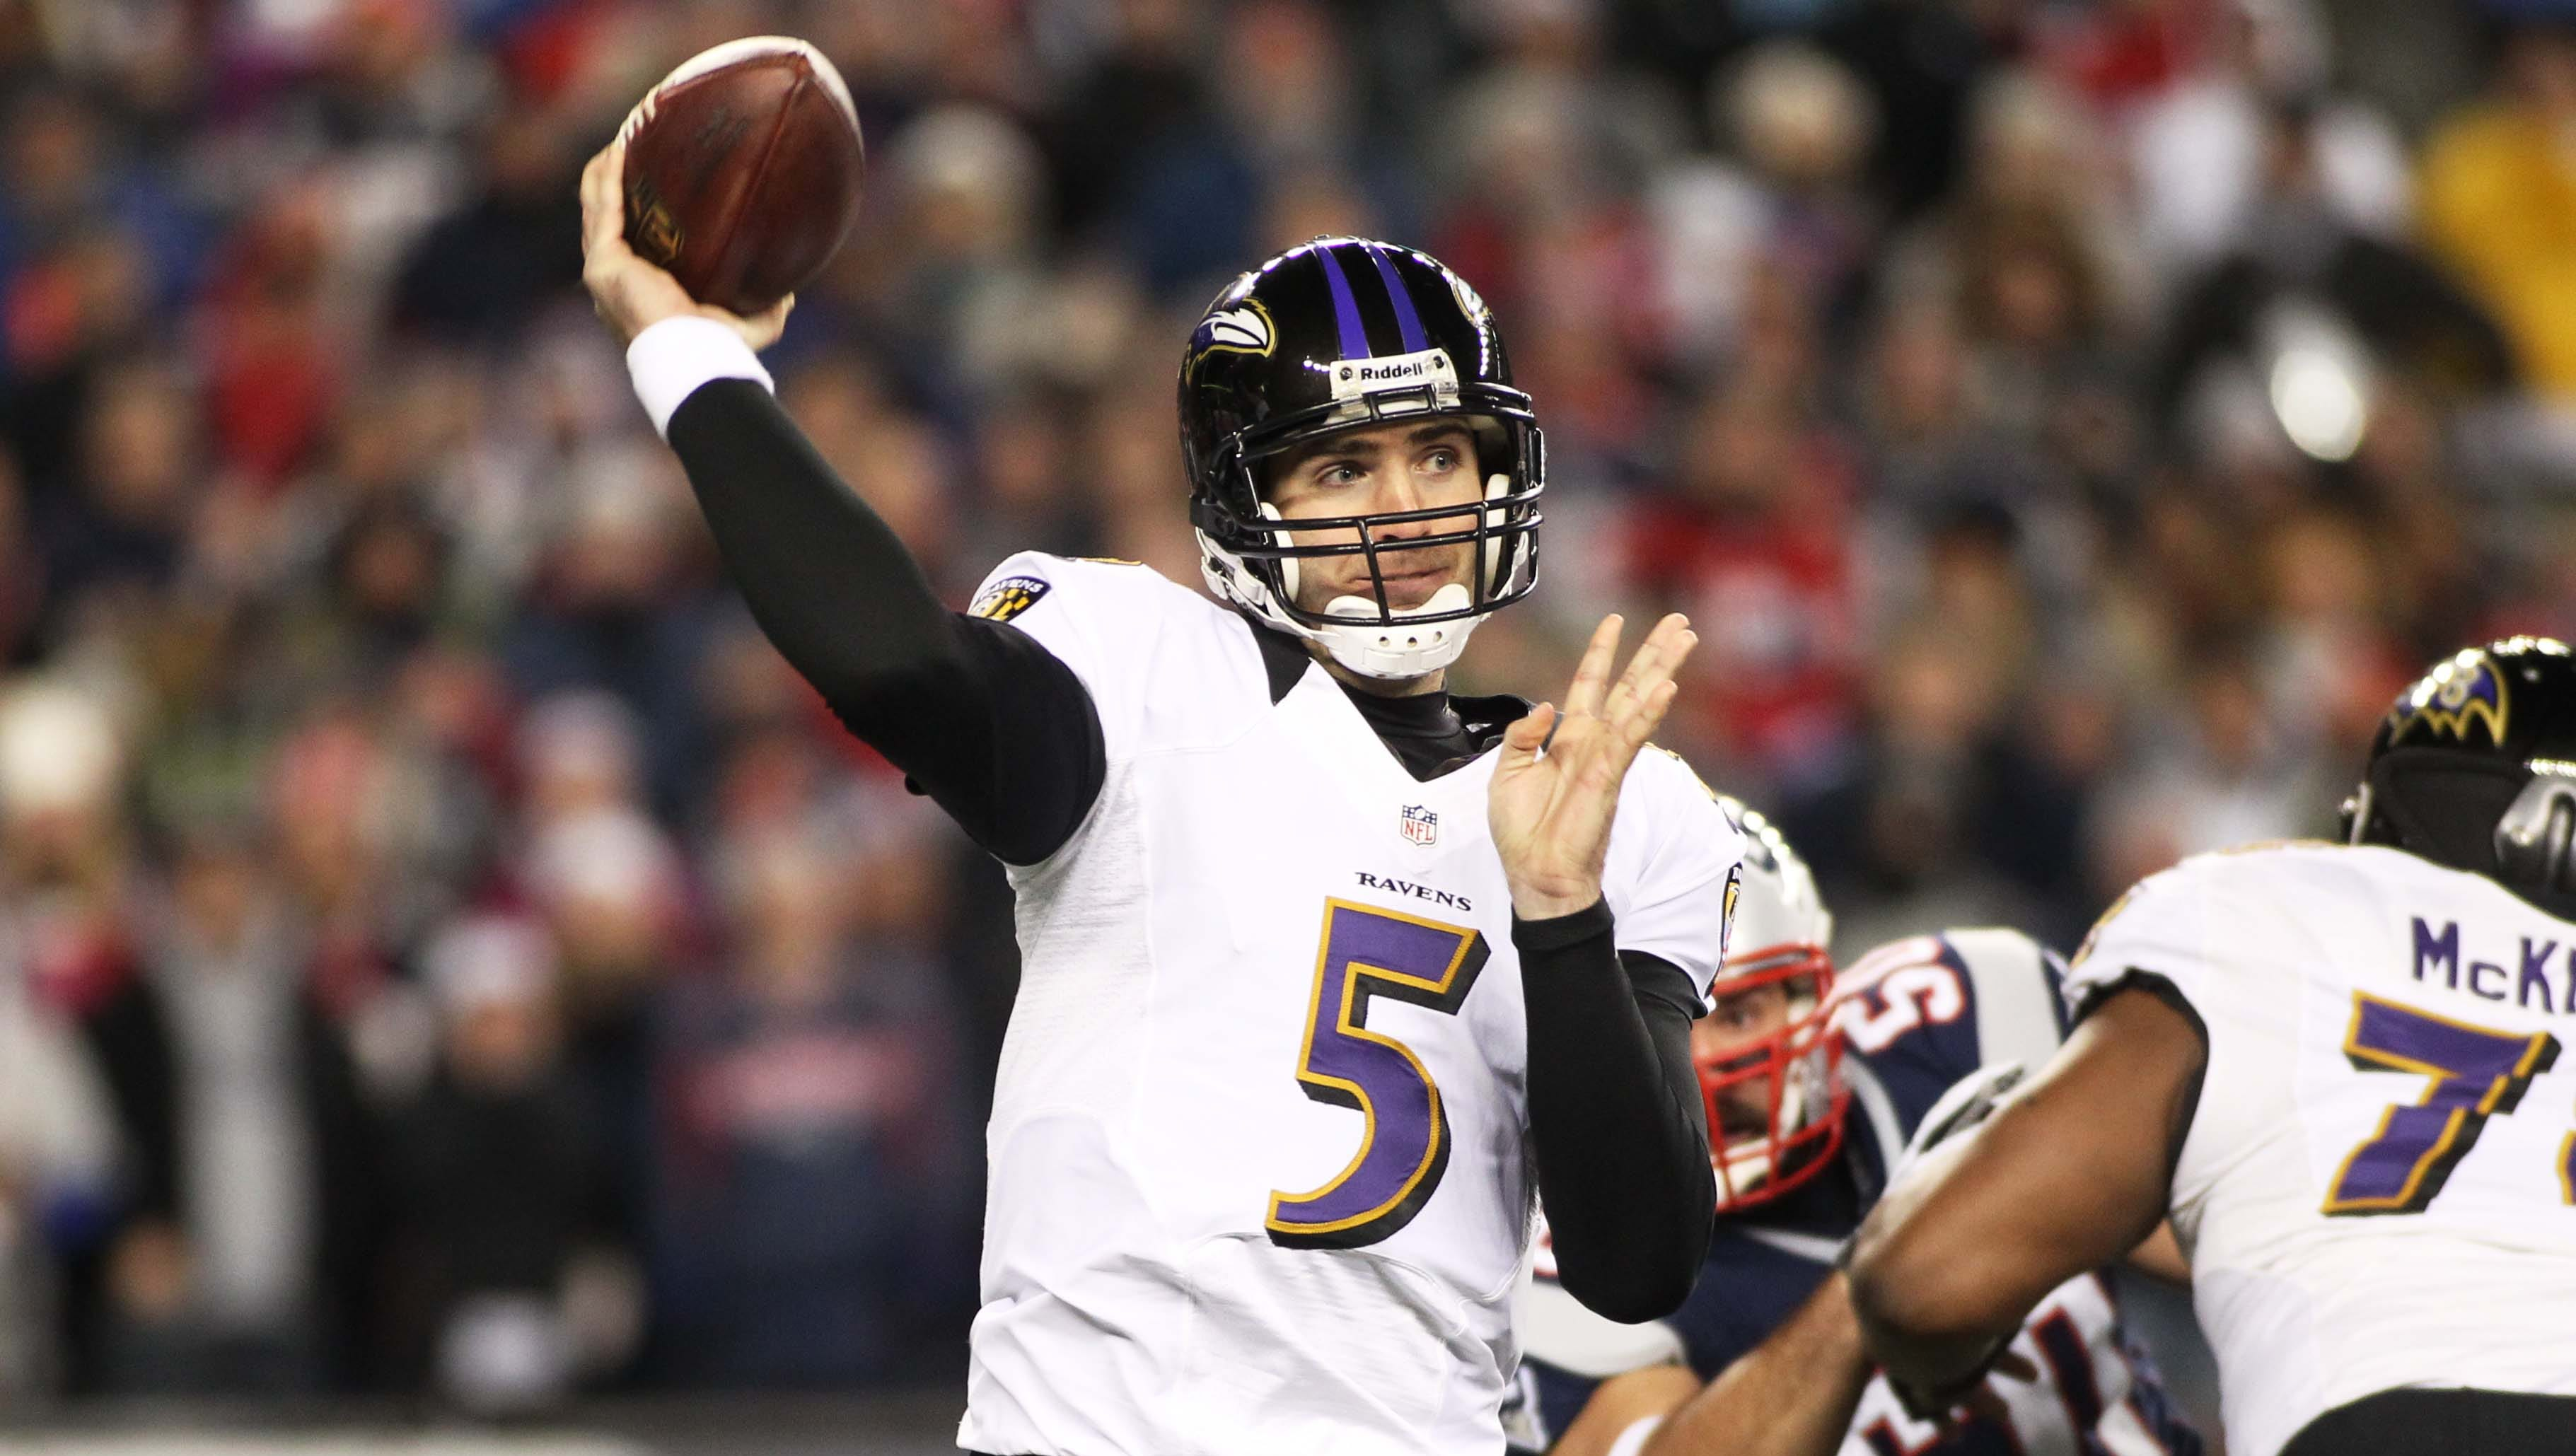 16. Joe Flacco, Baltimore Ravens